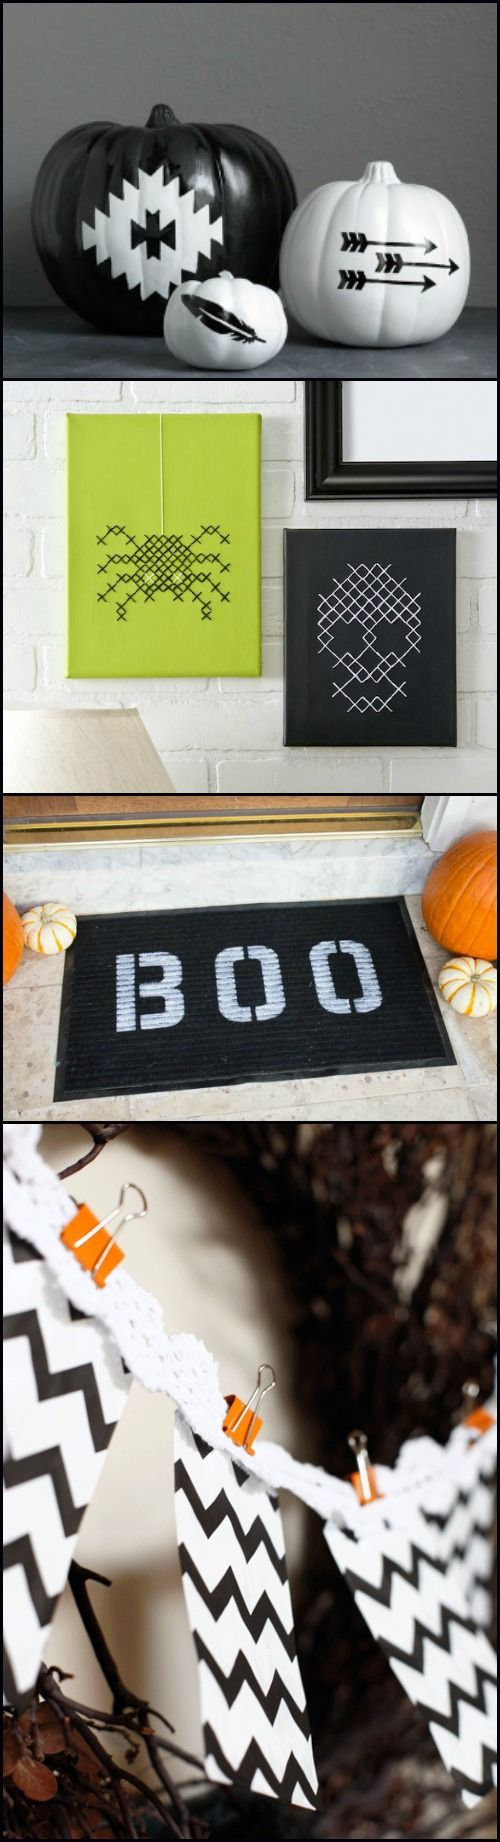 Diy halloween decor pinterest - 15 Diy Ideas For Modern Halloween Decor